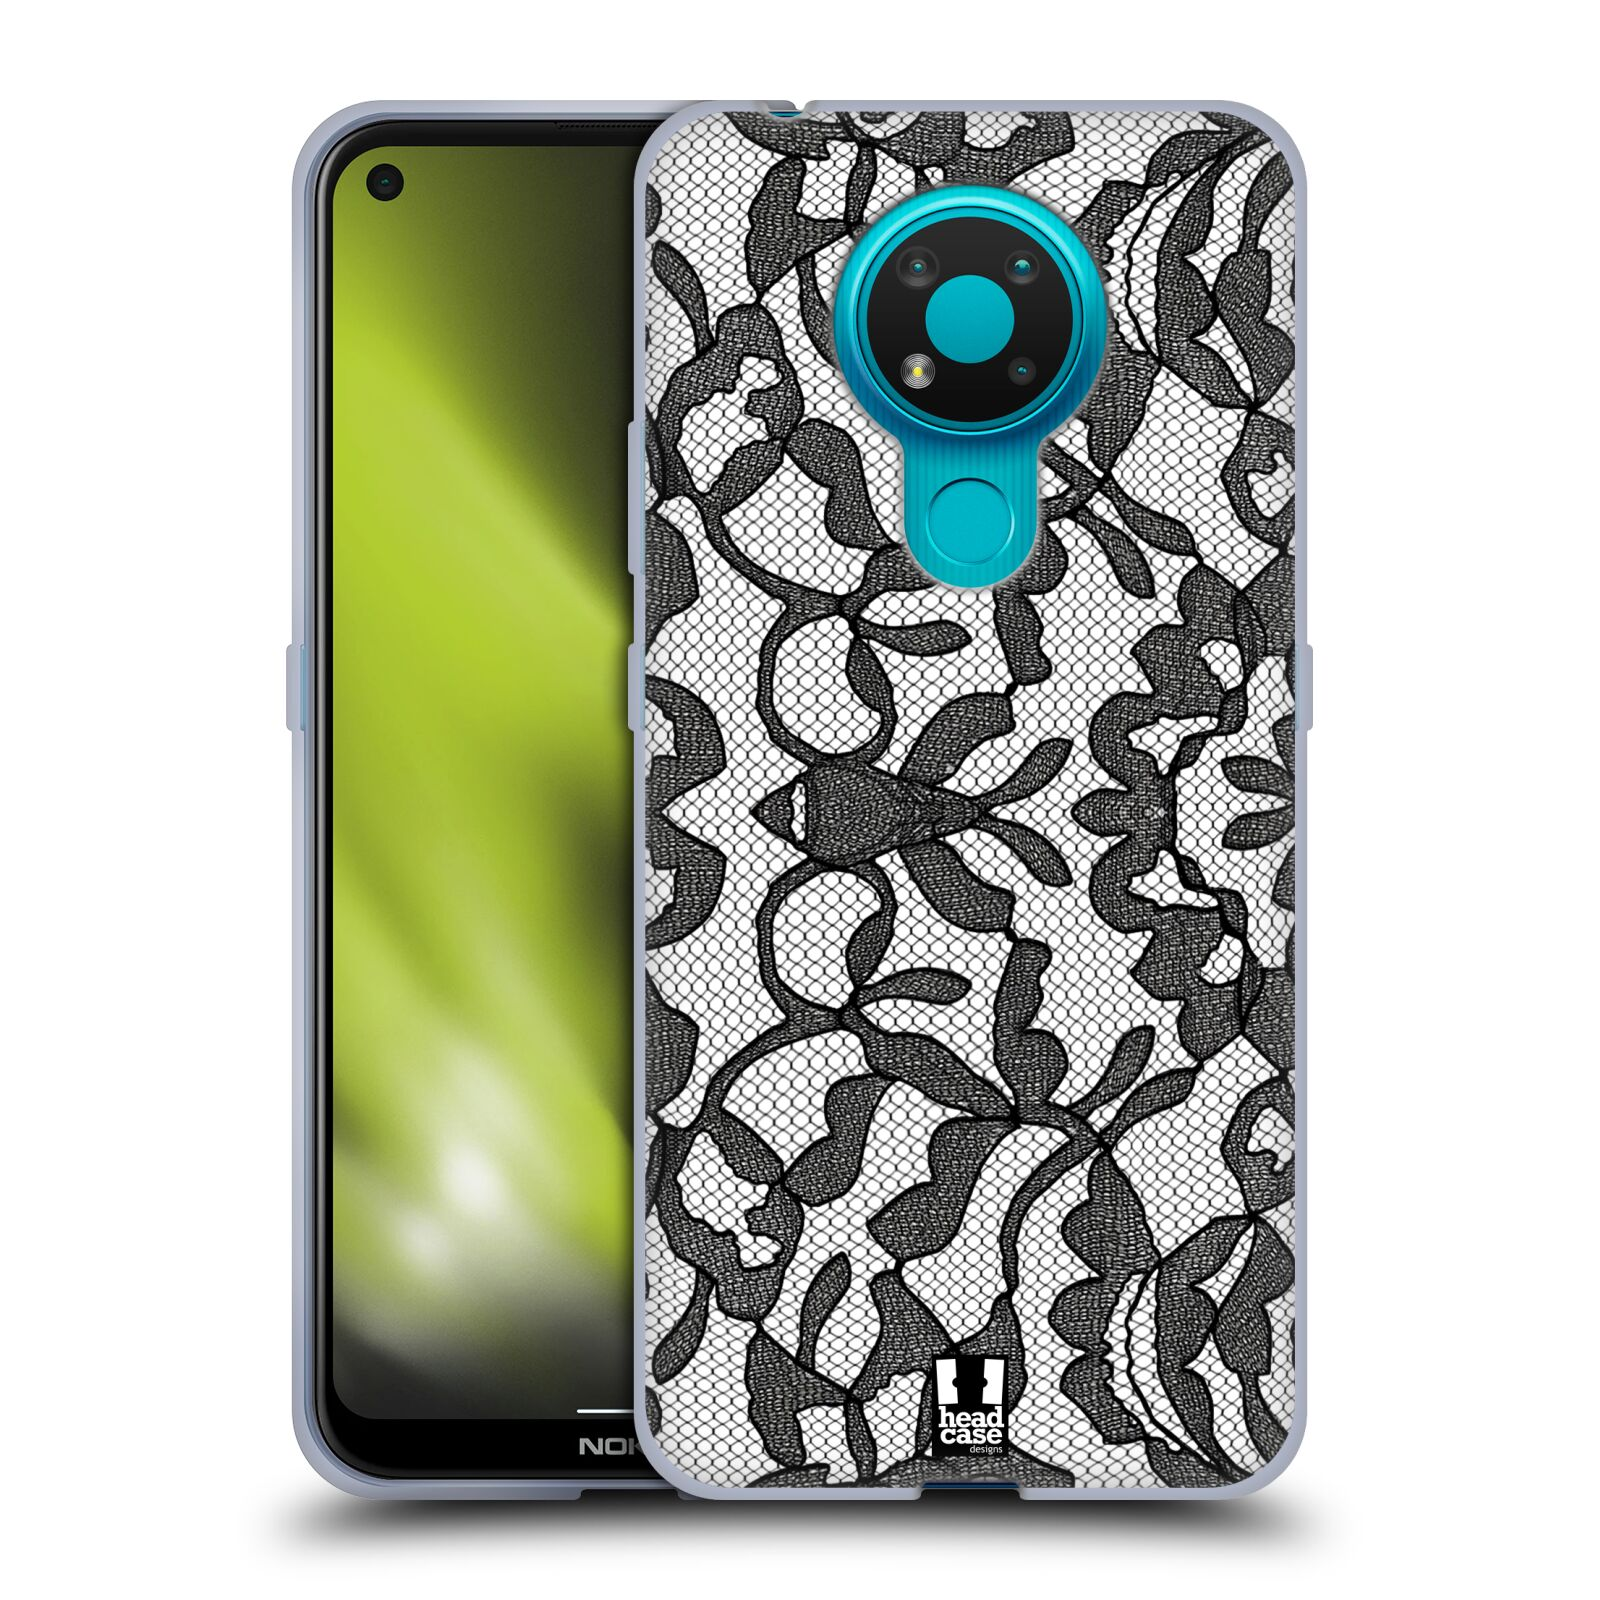 Silikonové pouzdro na mobil Nokia 3.4 - Head Case - LEAFY KRAJKA